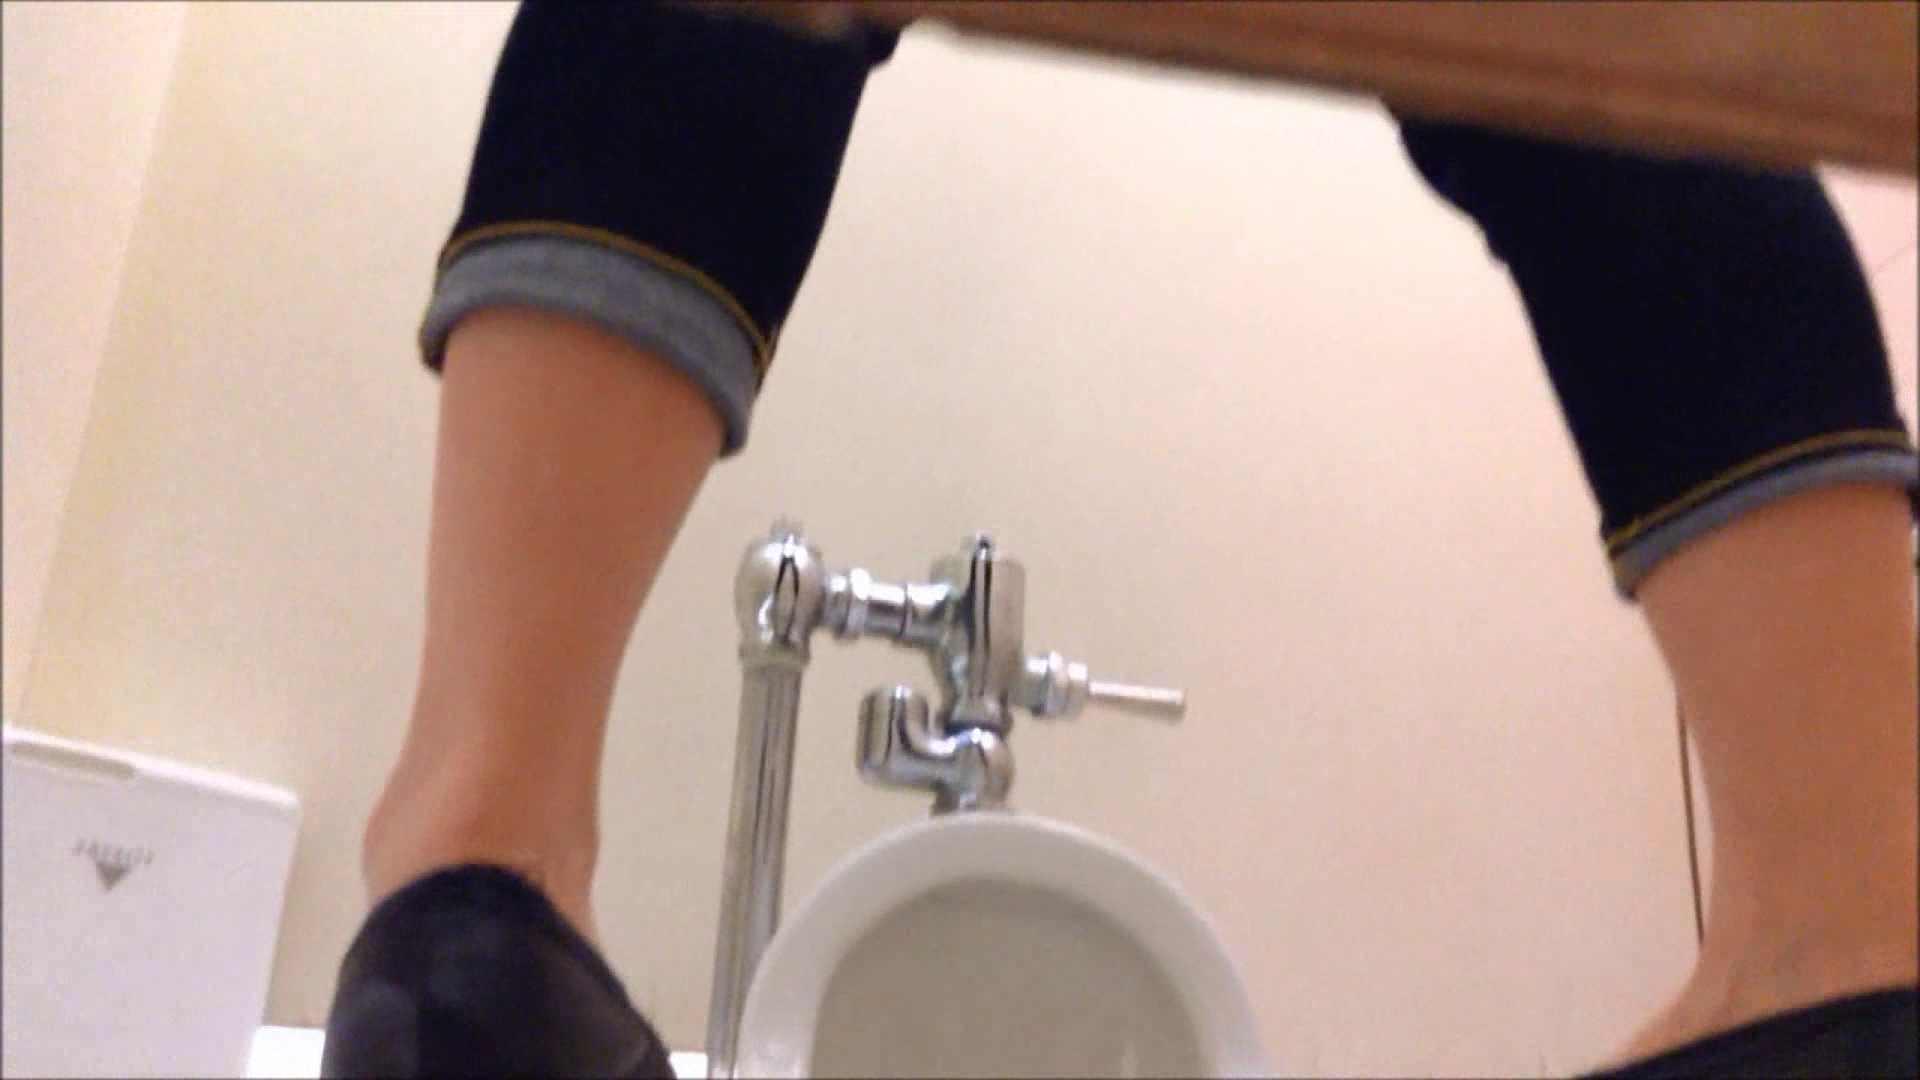 某有名大学女性洗面所 vol.17 和式 のぞき動画画像 108連発 51